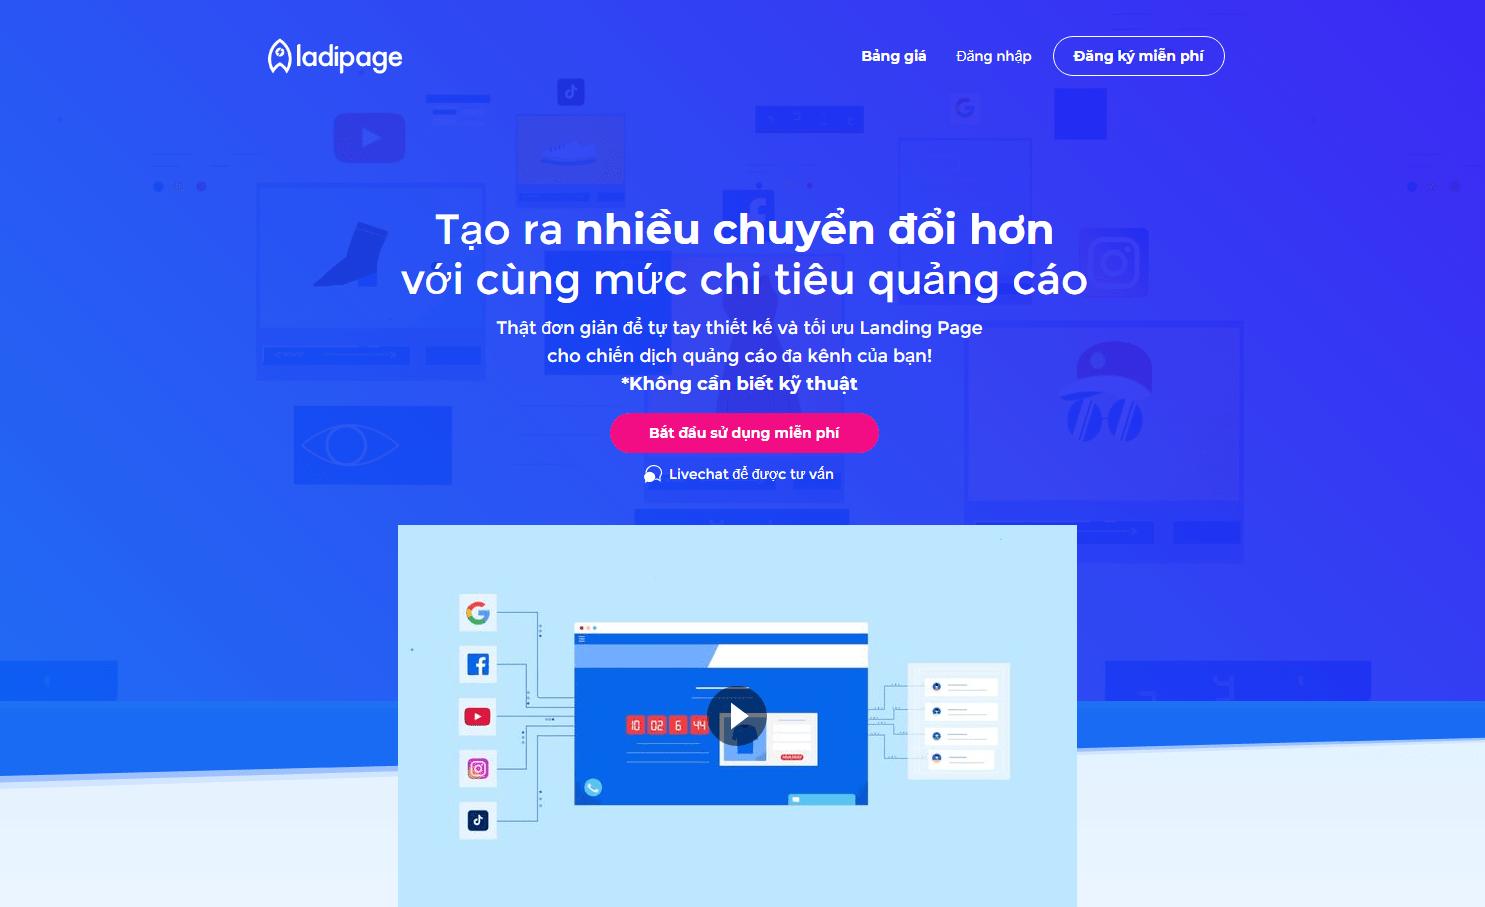 website tao landing page mien phi1